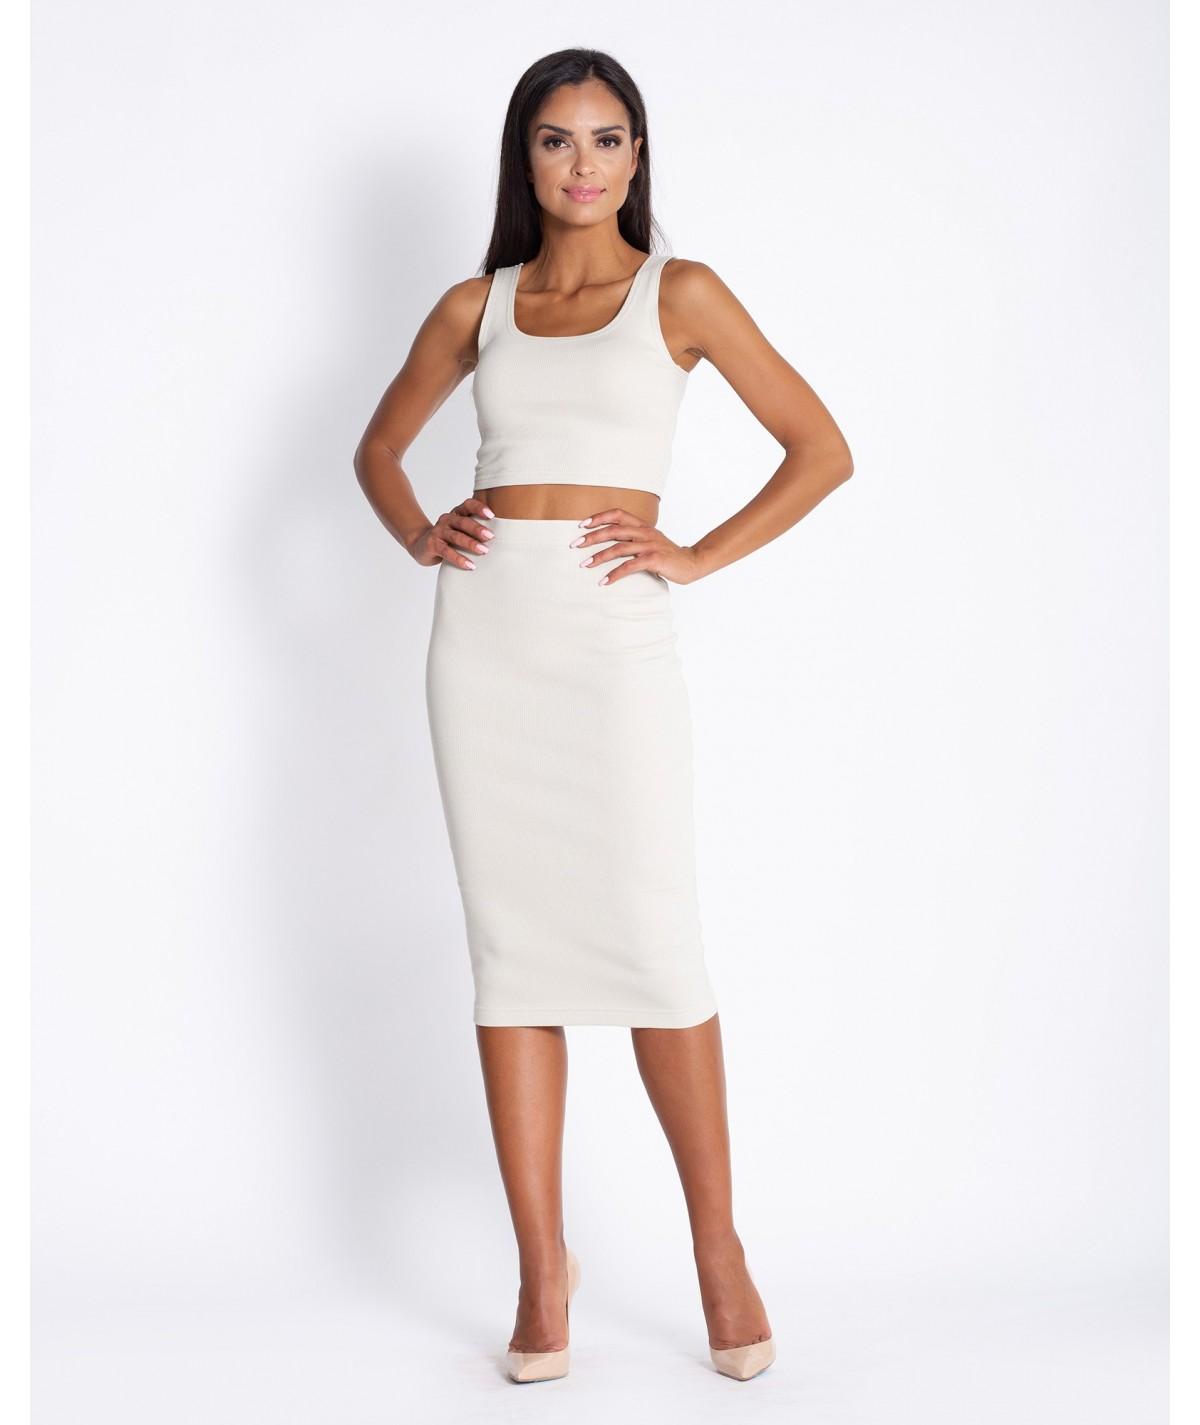 Bezowy komplet damski - spódnica + top Dursi